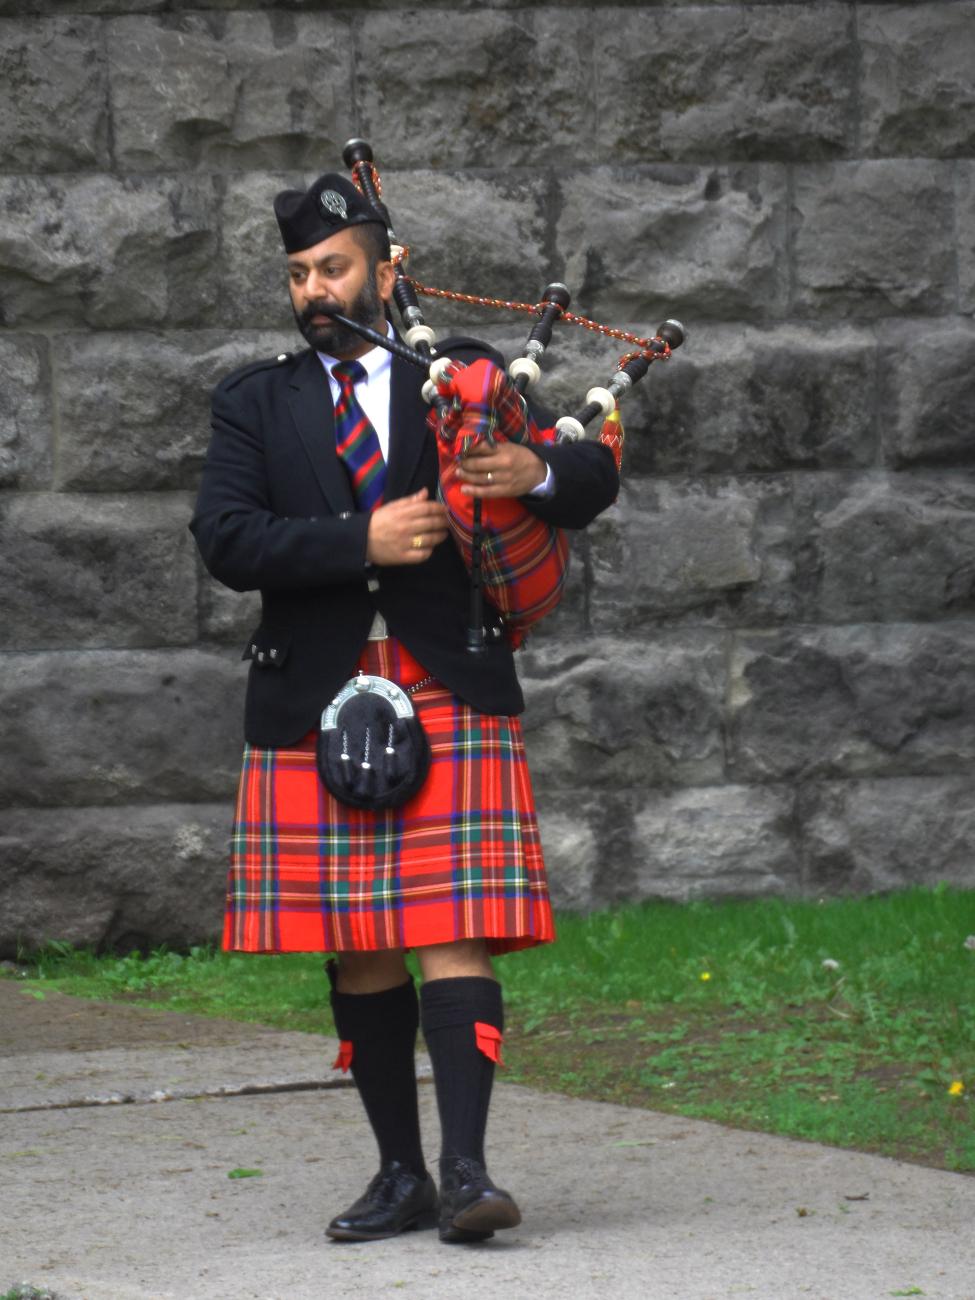 A Bag Pipe Player At McGill University's Undergrad Graduation